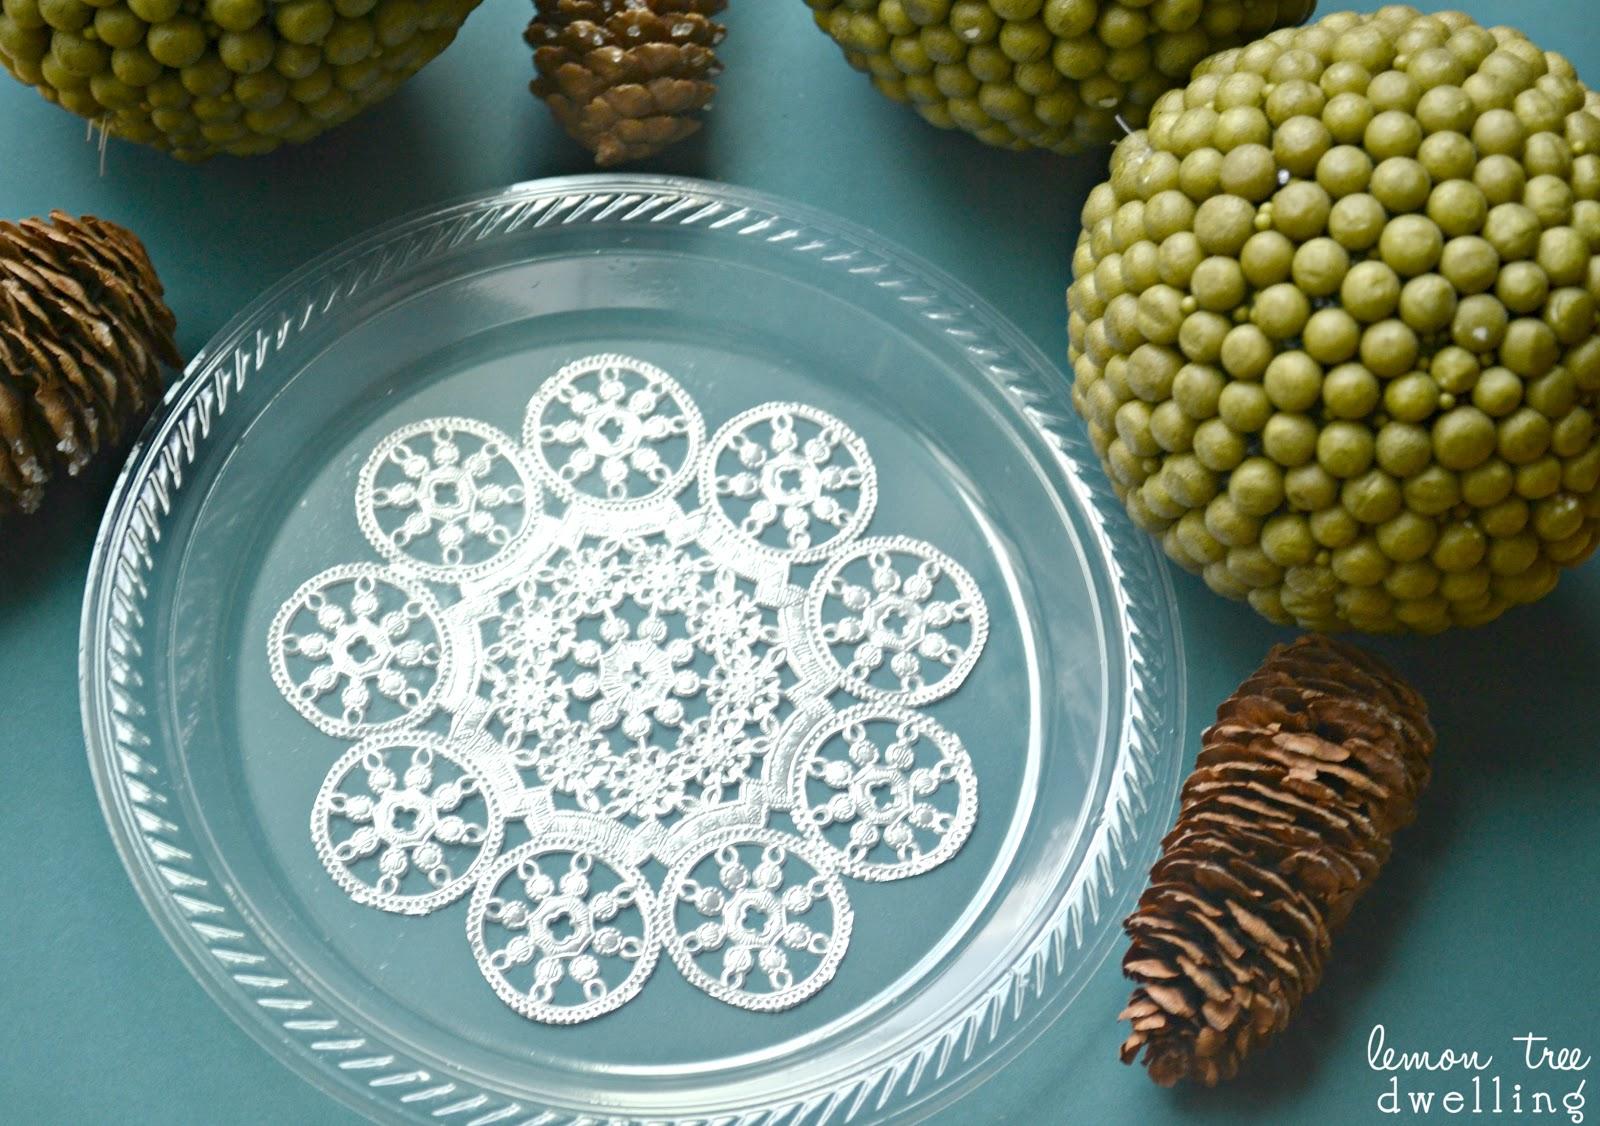 Simple \u0026 elegant DIY Holiday Plates - perfect for Christmas! & DIY Festive Holiday Plates | Lemon Tree Dwelling